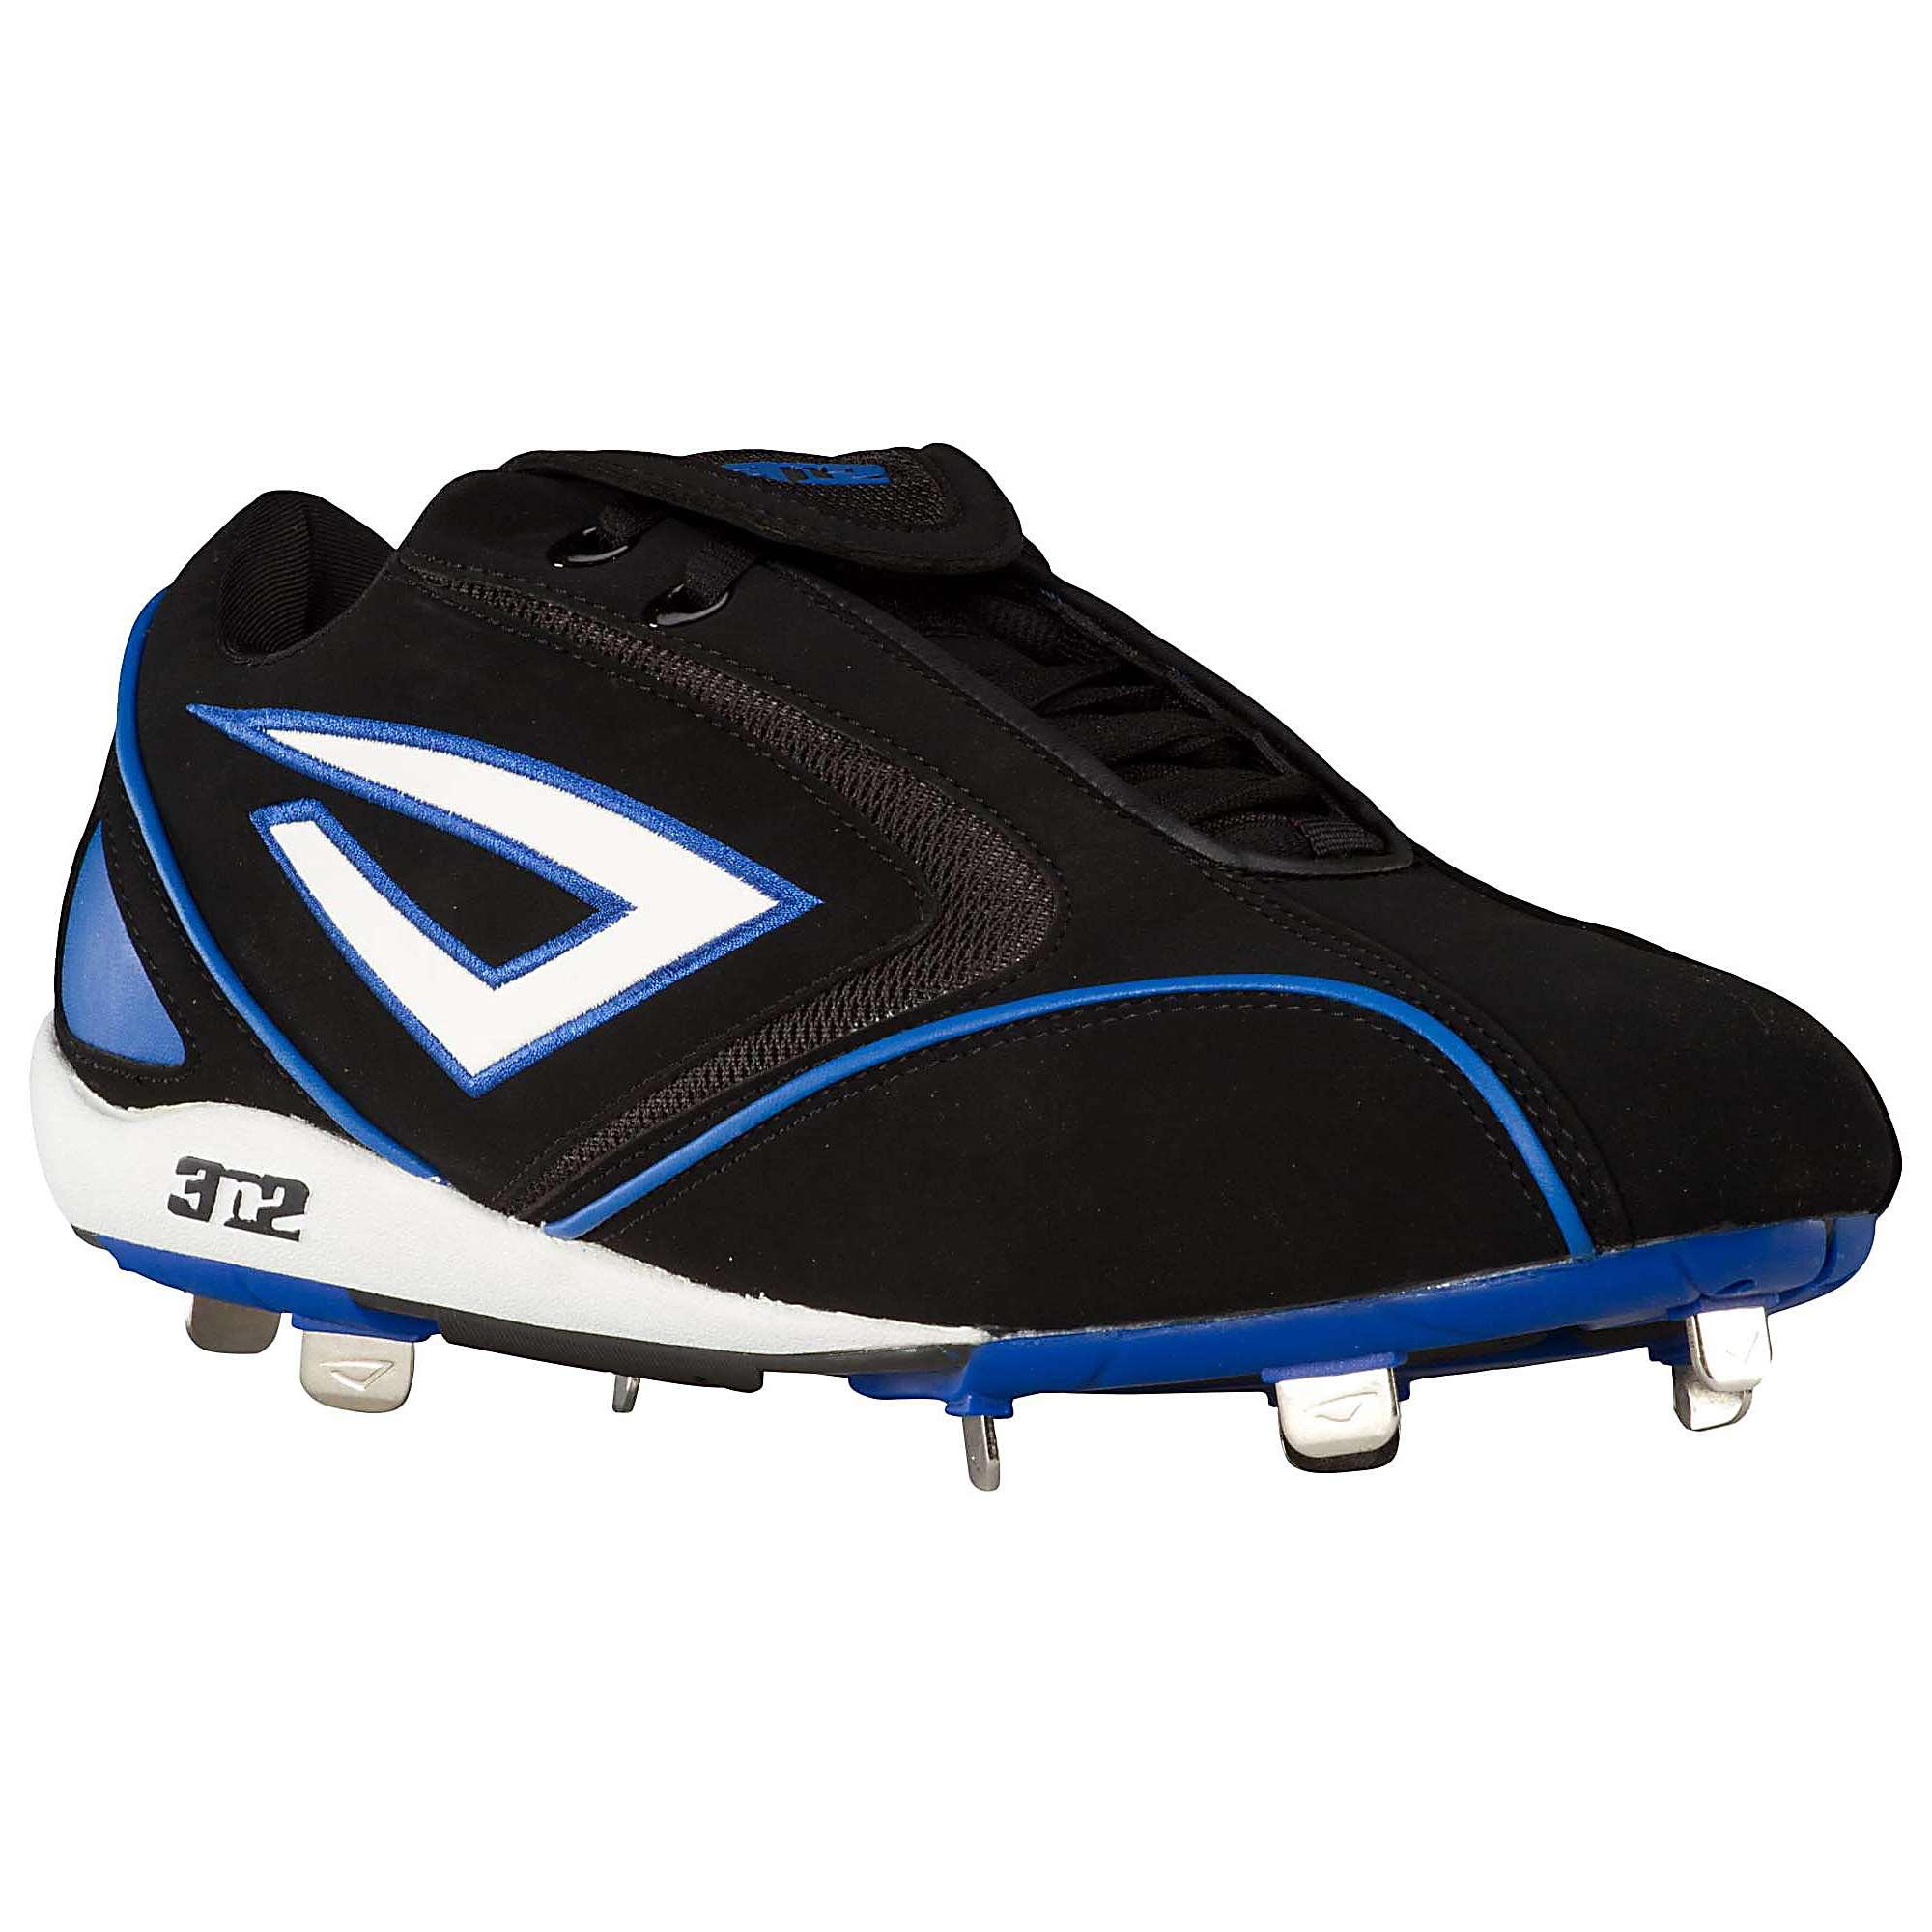 3N2 Men's Pyro Low Metal Baseball Cleats Shoes Black ...